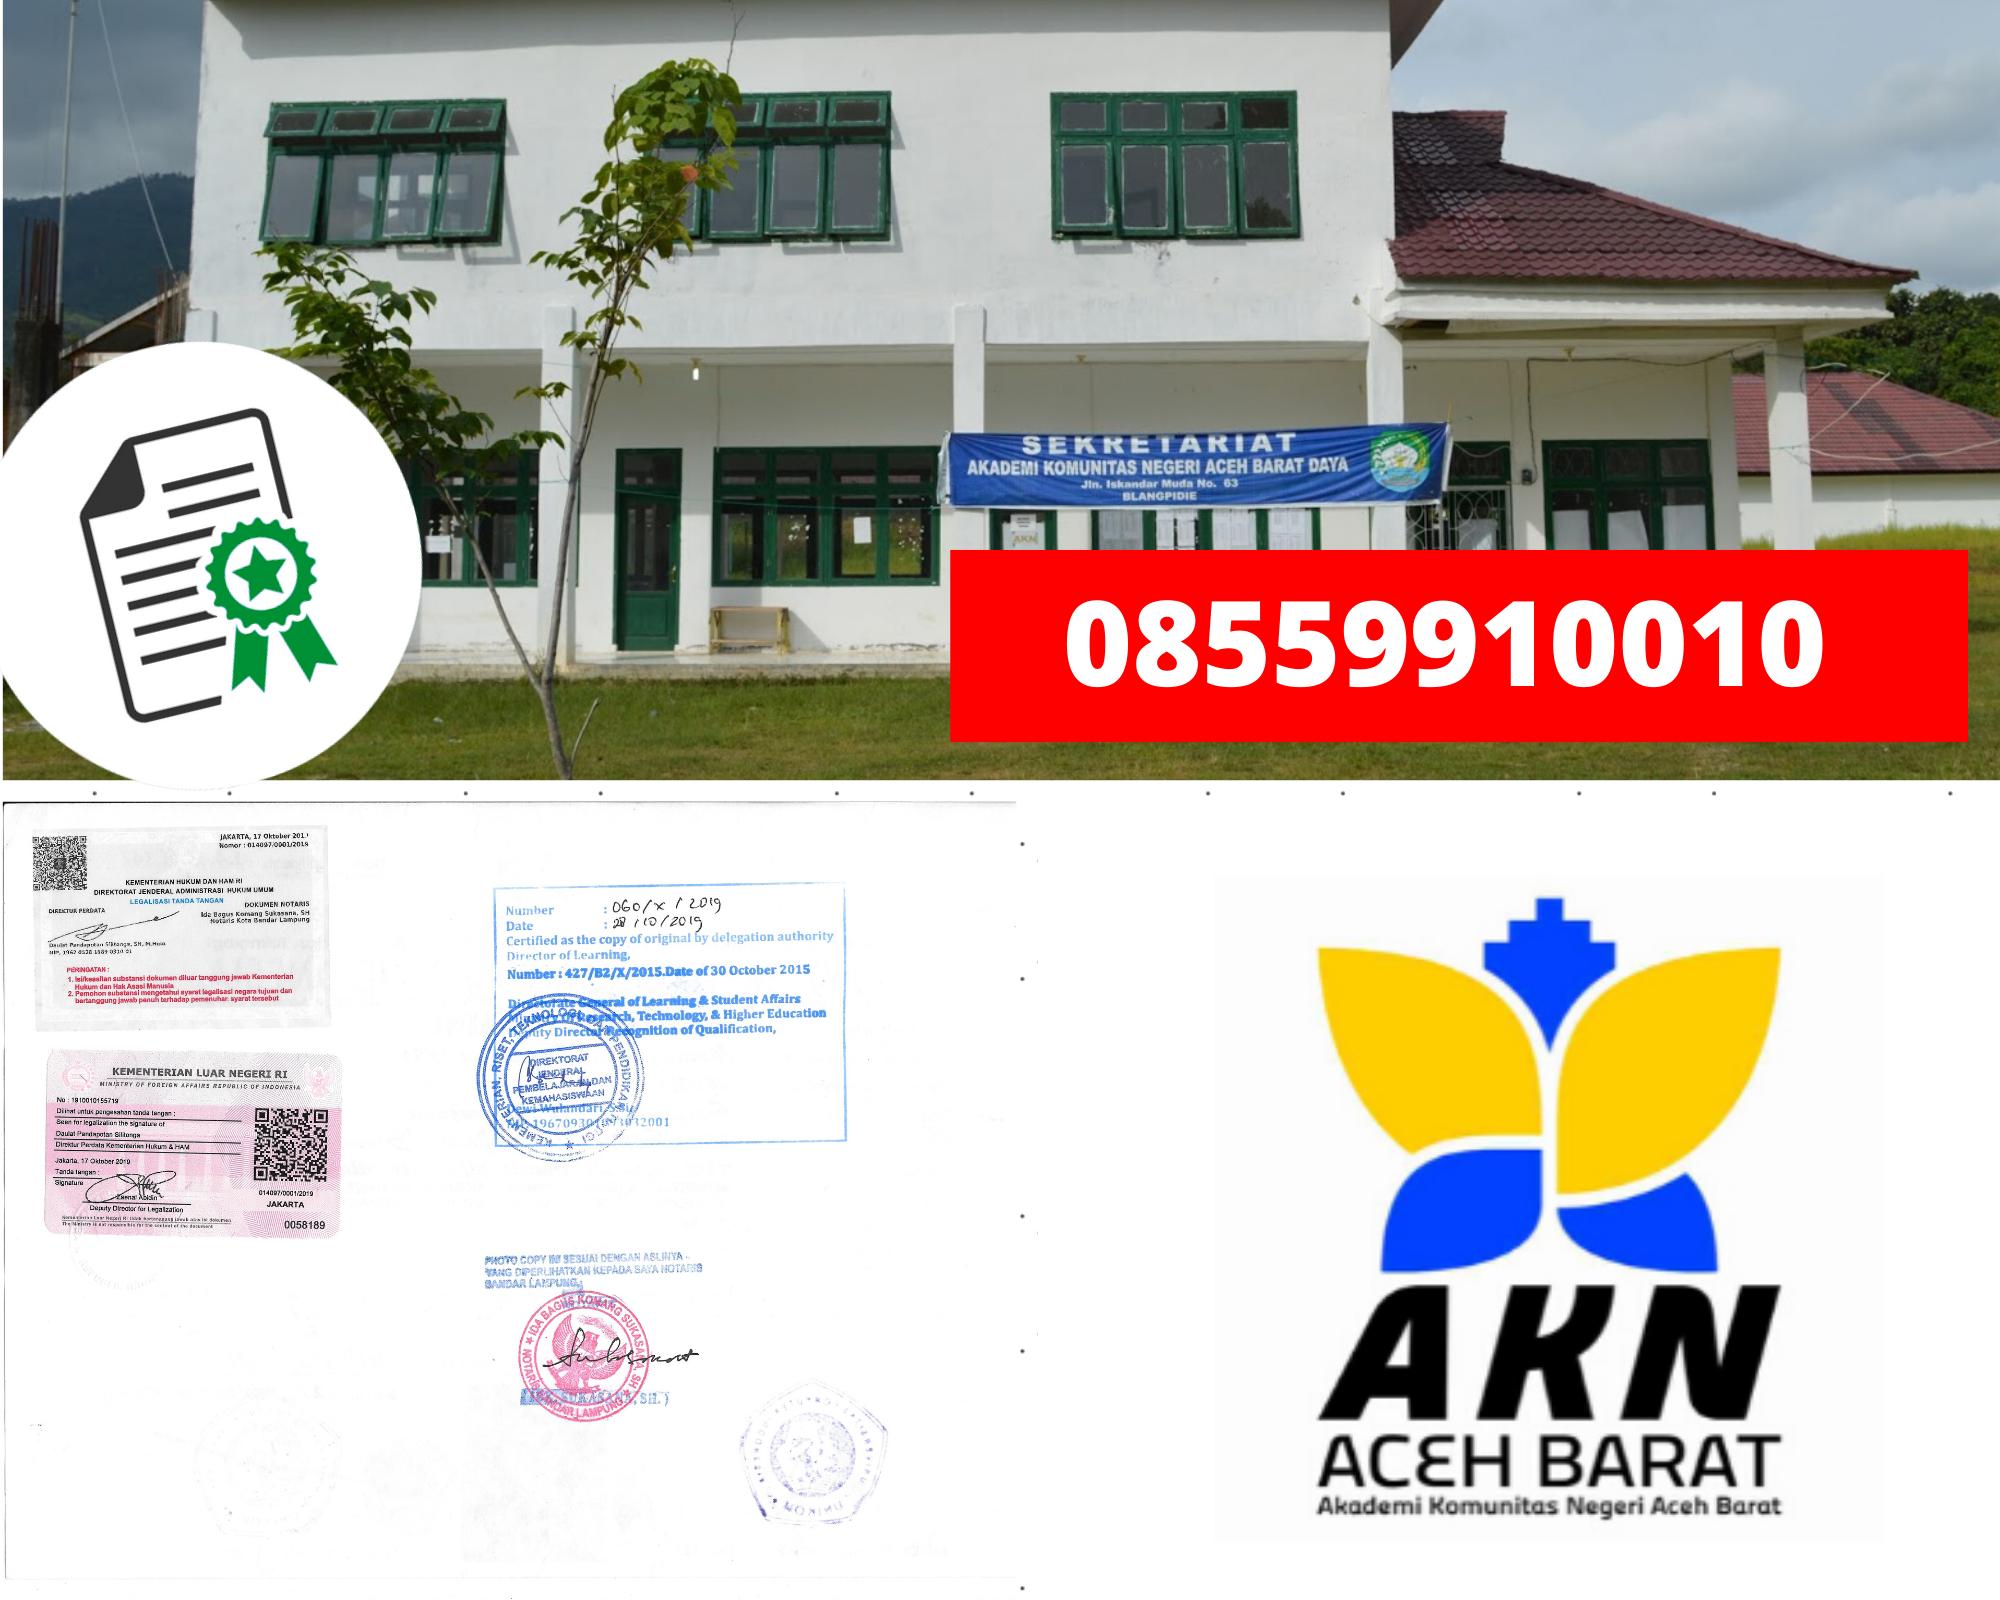 Legalisir Ijazah Akademi Komunitas Negeri  Aceh Barat Di Kemenristek Dikti || 08559910010